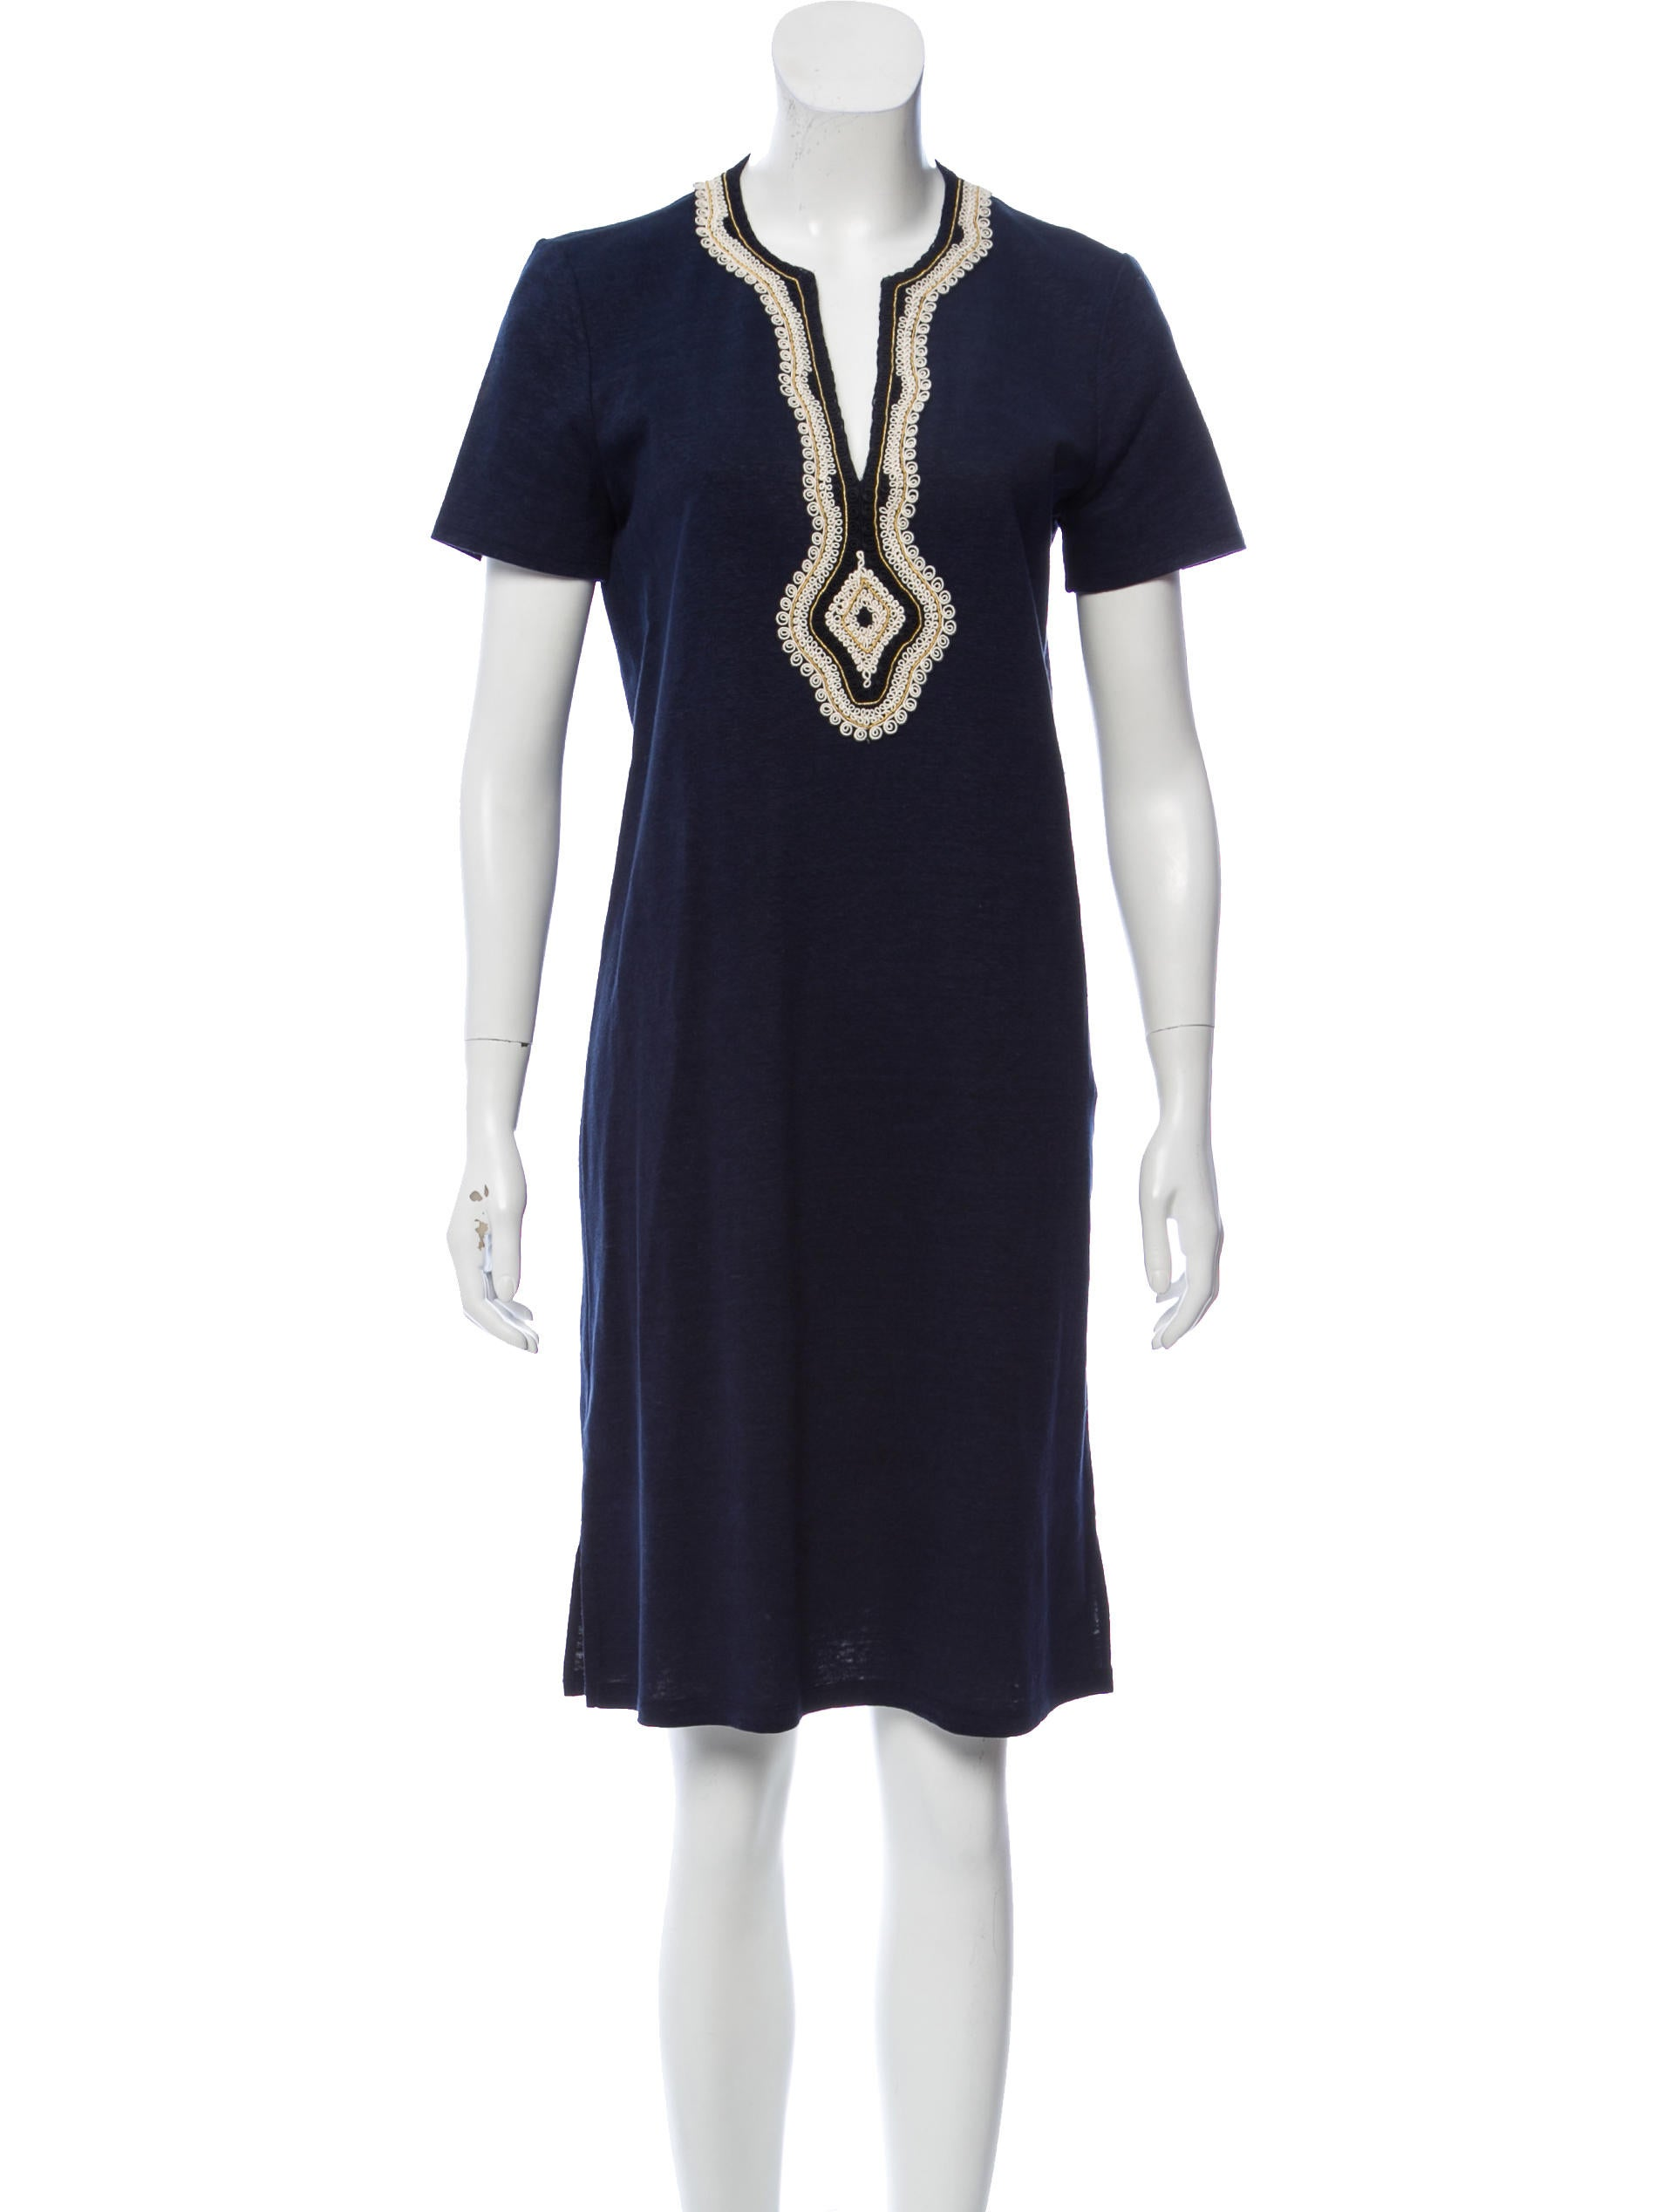 f7e64068788 Tory Burch Linen Knee-Length Dress - Clothing - WTO177273